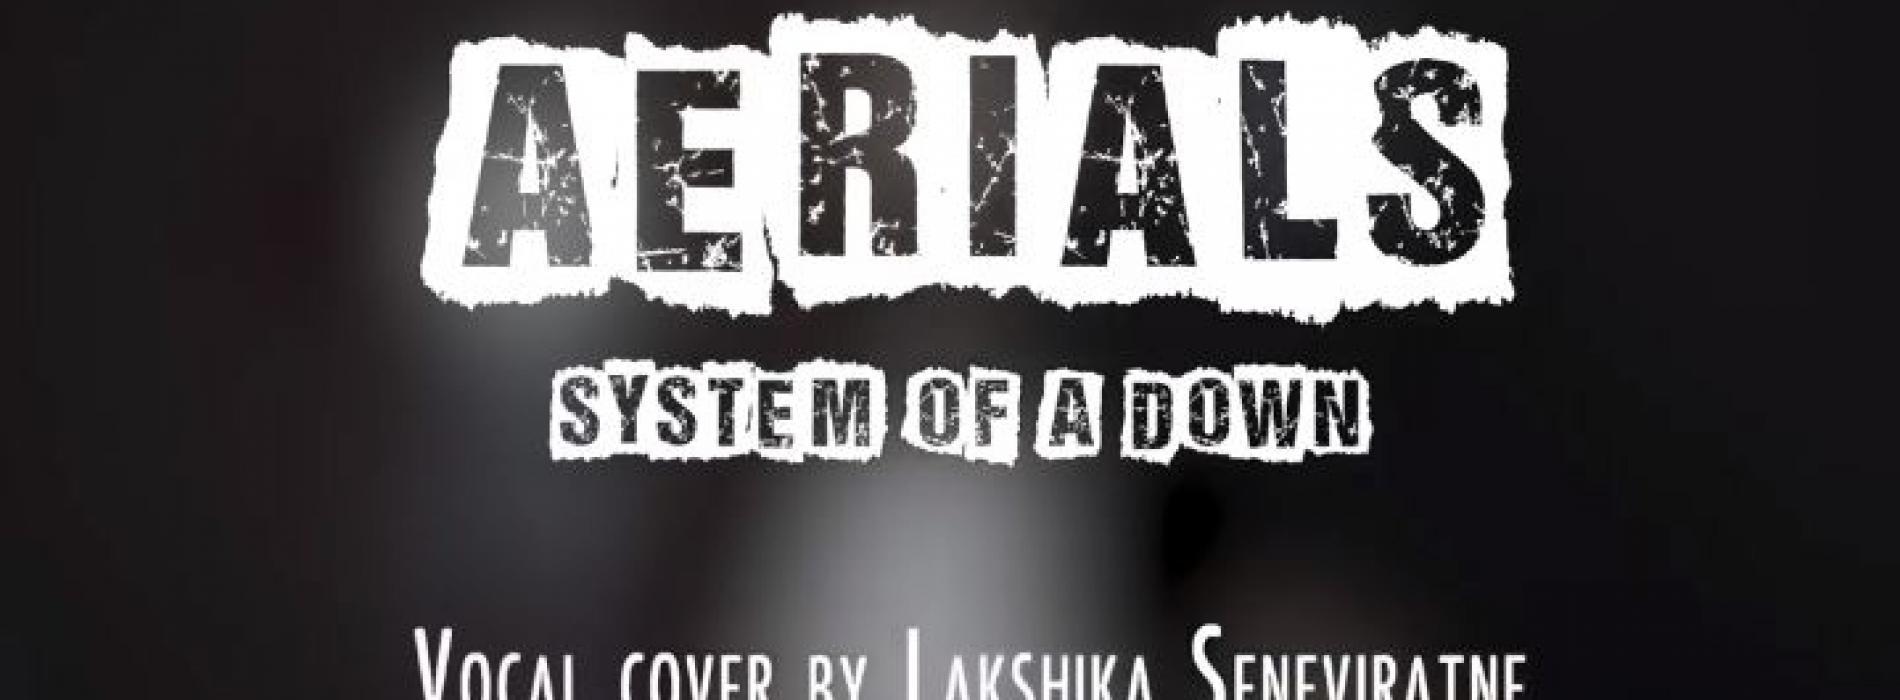 New Music : SOAD – Aerials (Vocal cover by Lakshika Seneviratne)